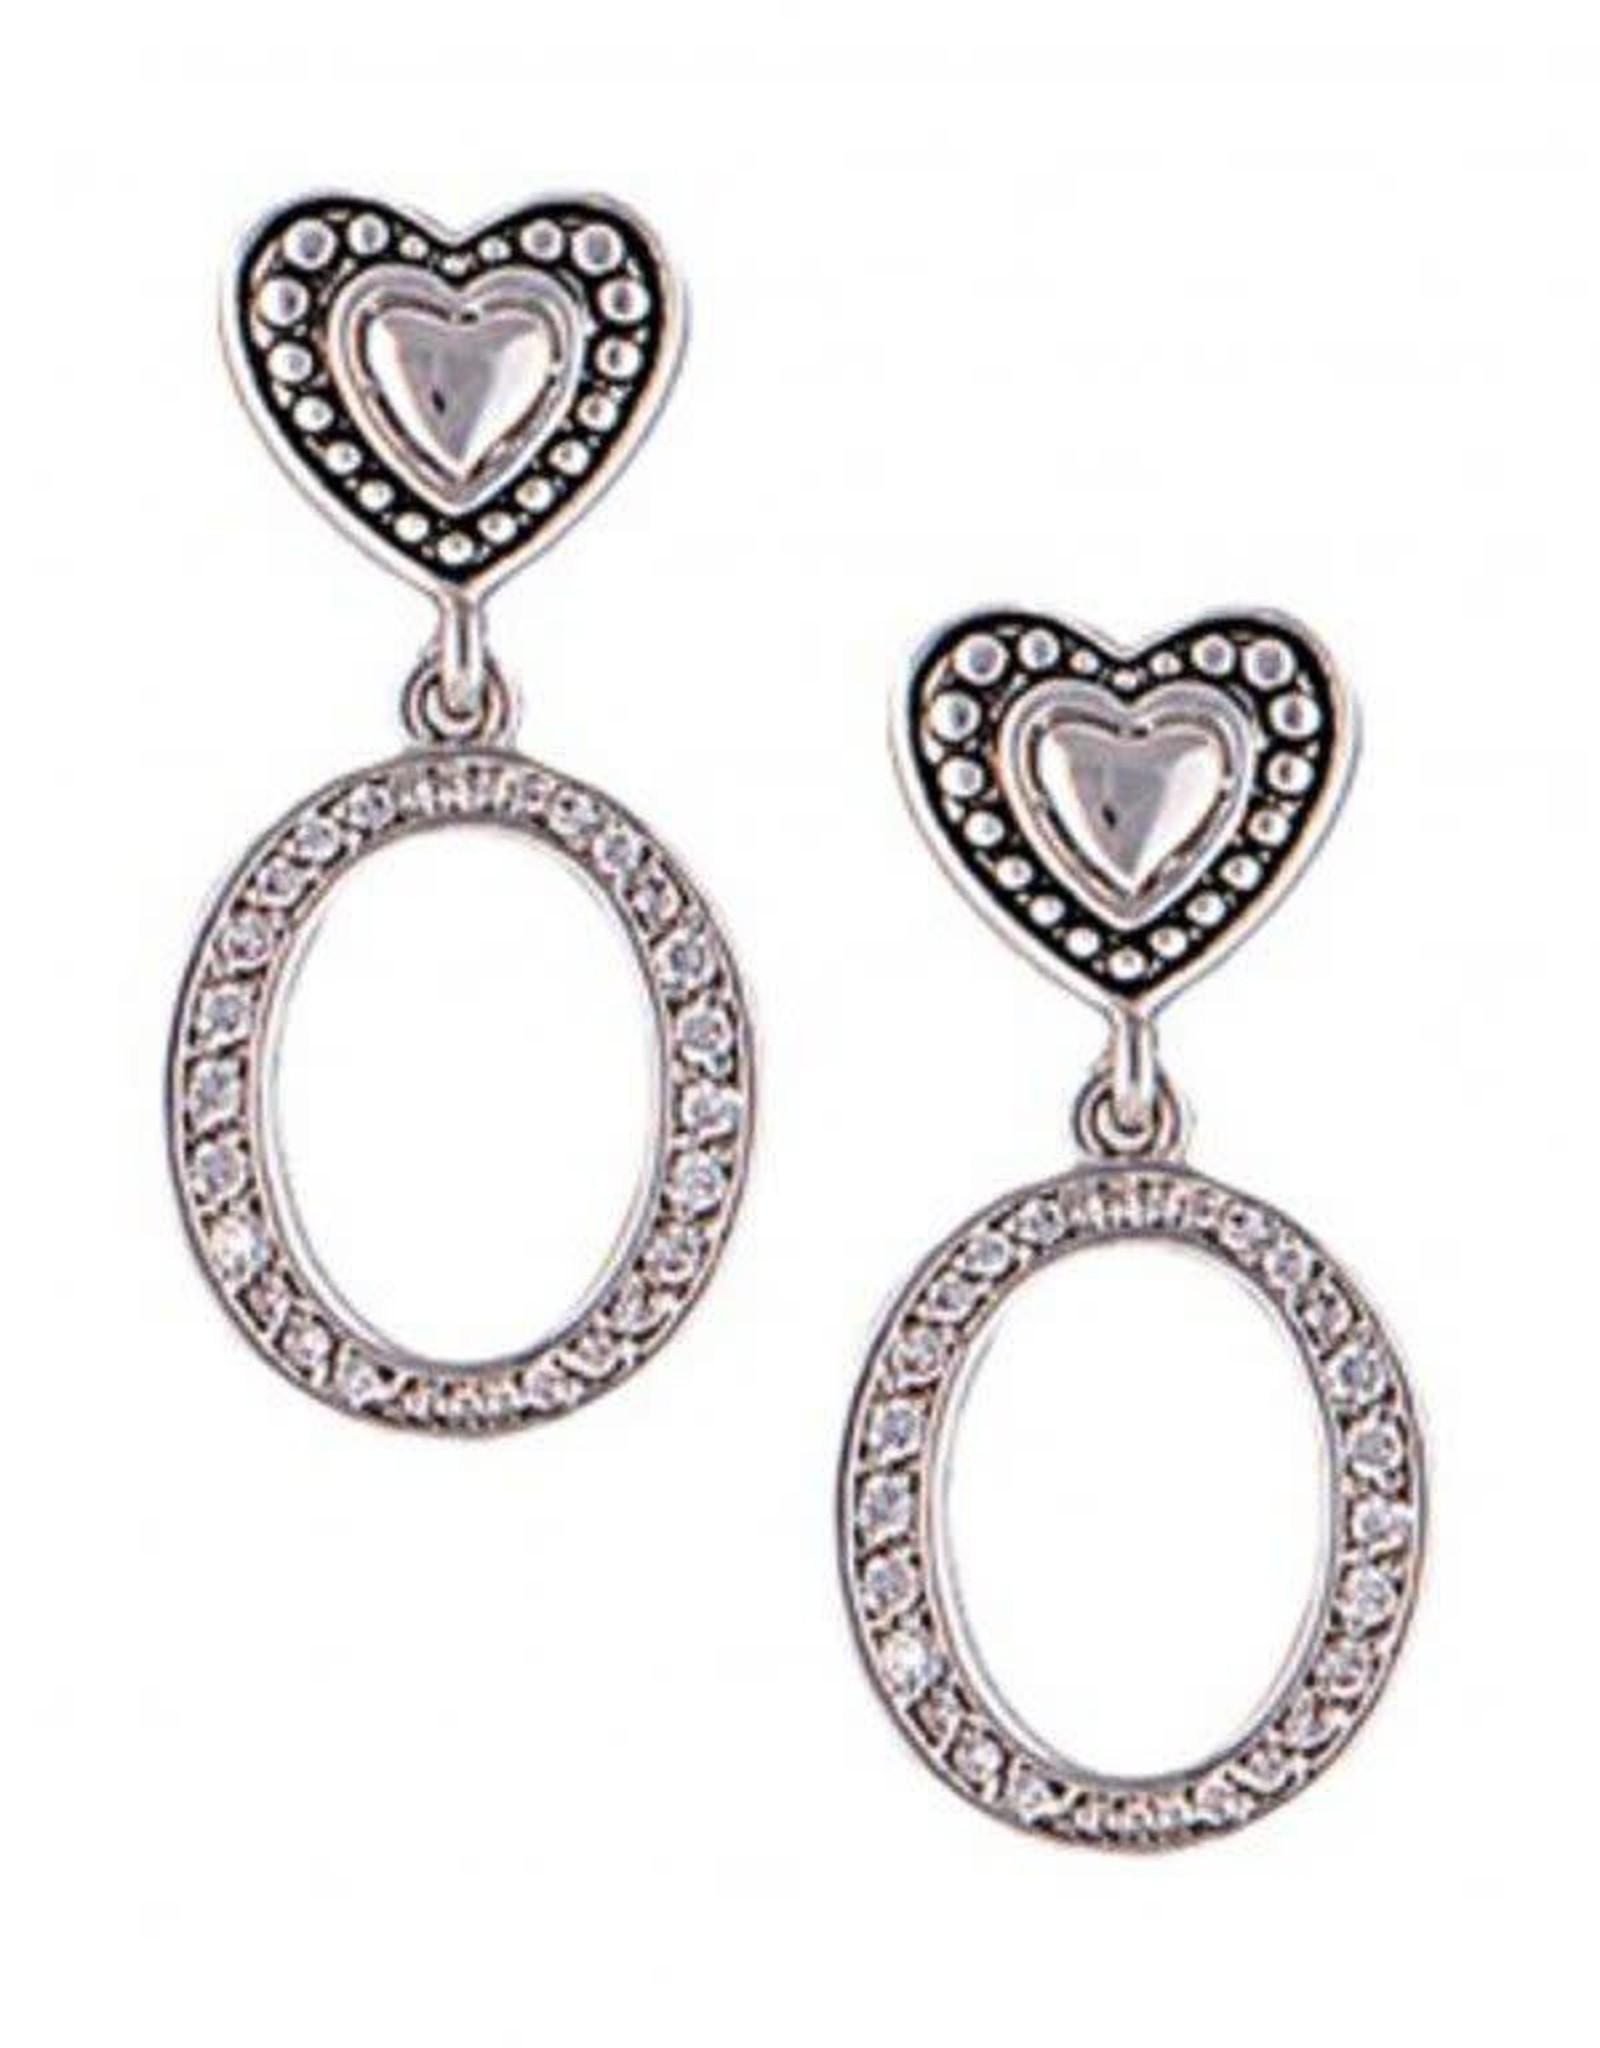 Montana Silversmiths Charm Hearts & Hoops  Silver Earrings ER1862